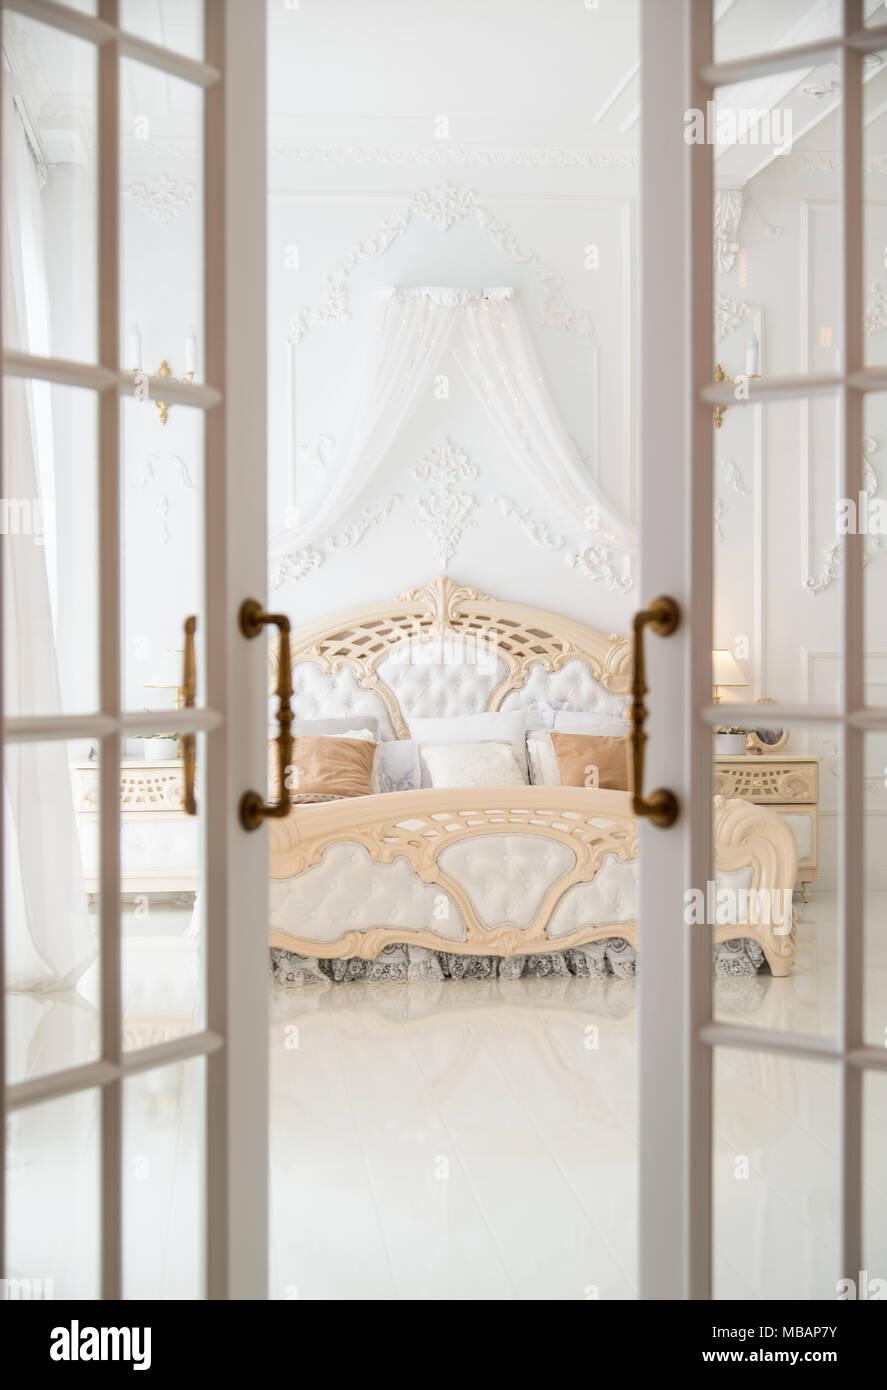 Open door leading to white classic bedroom - Stock Image